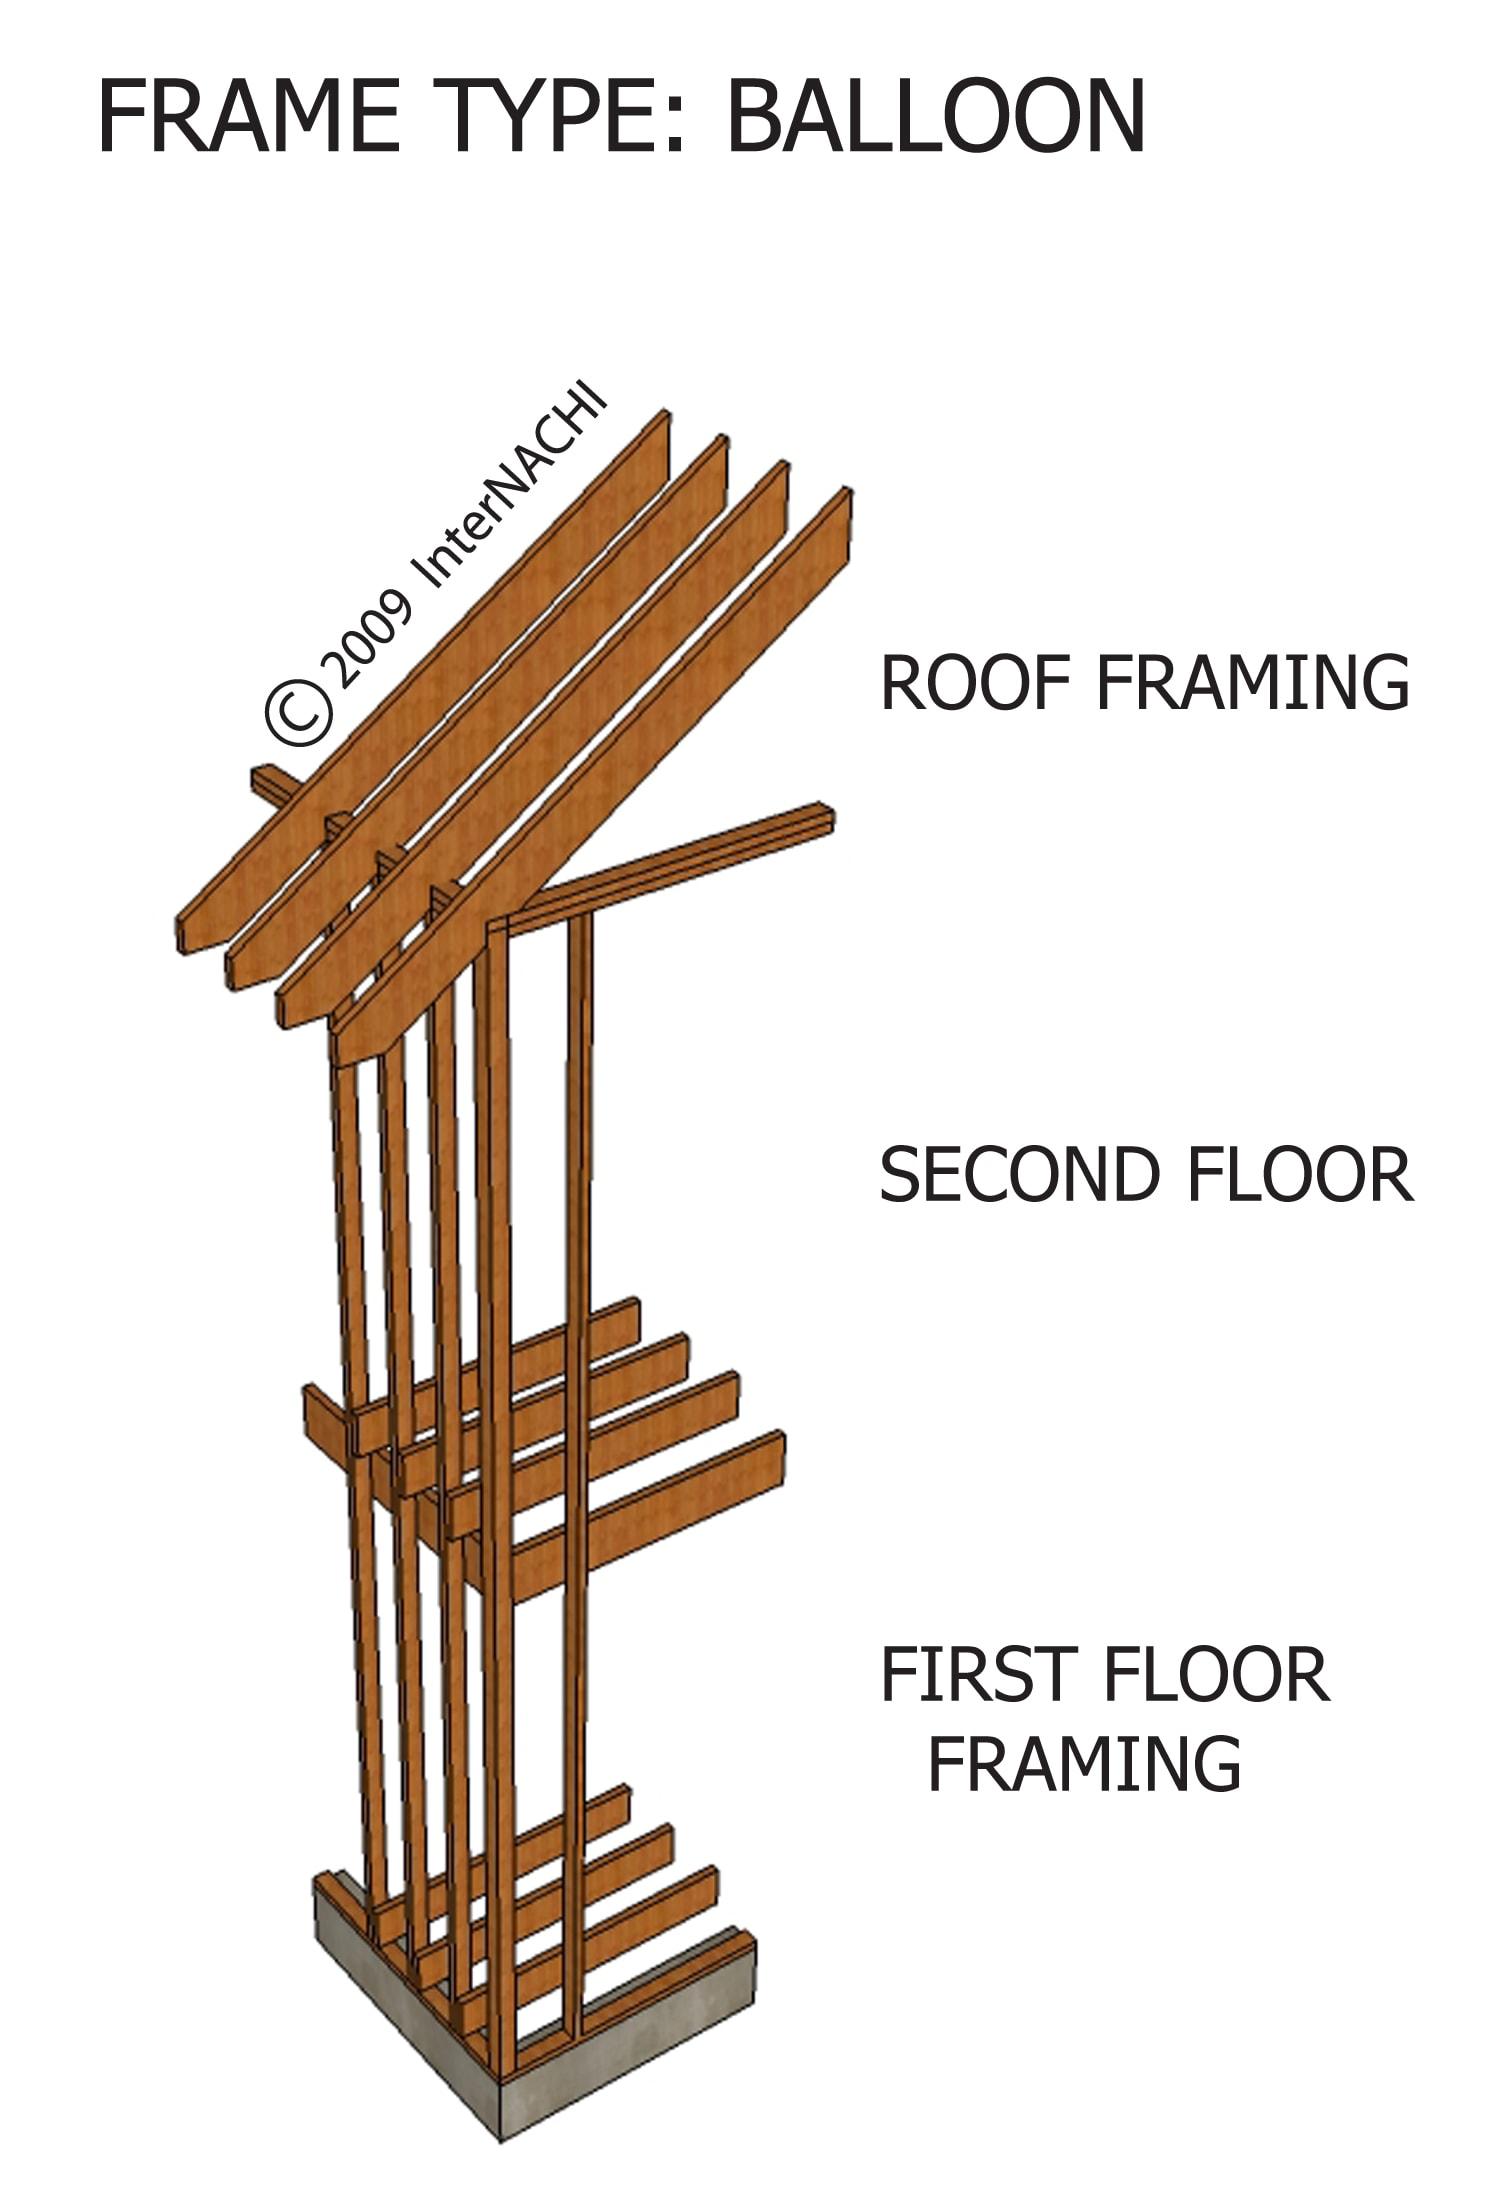 InterNACHI Inspection Graphics Library: Framing » Framing. » frame ...